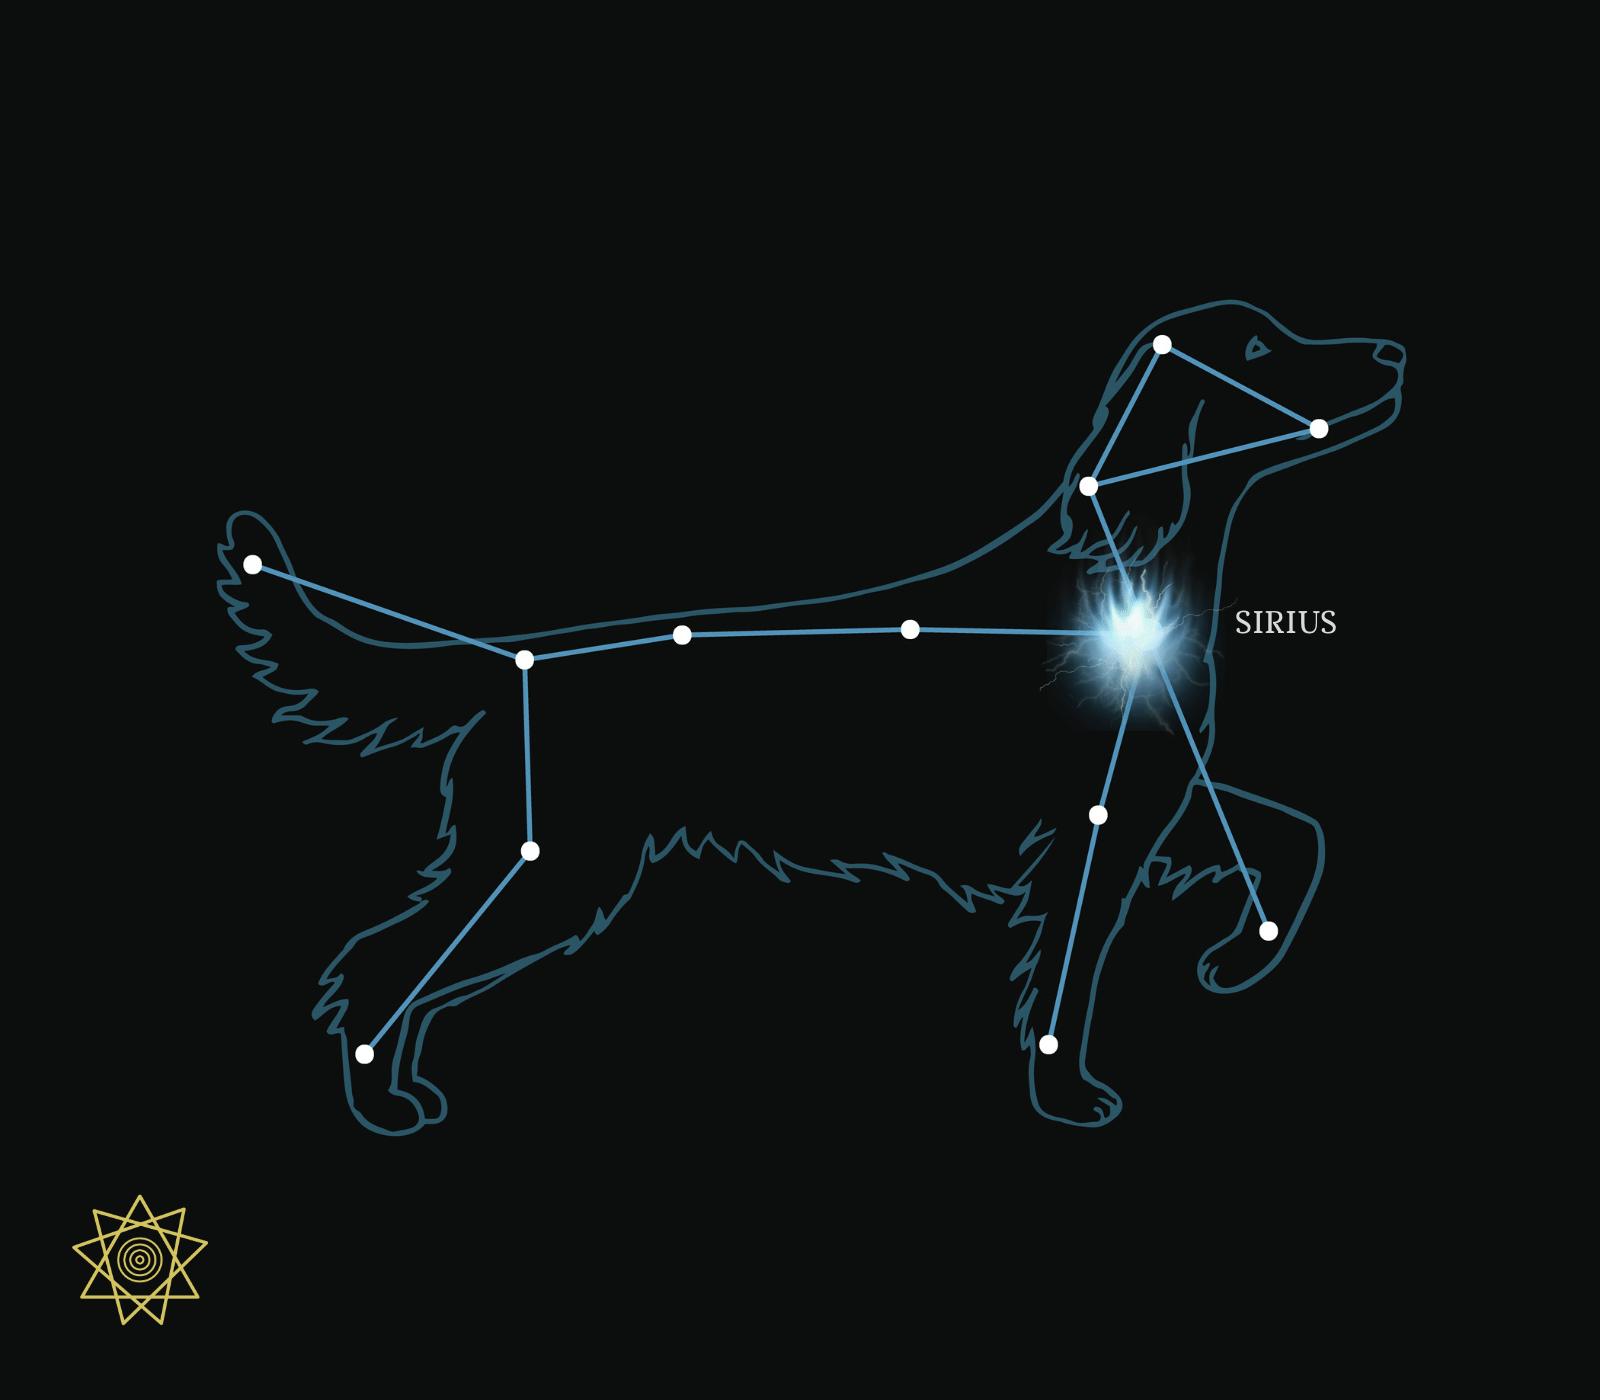 Stellar Code Sirius 2011 Teleconference